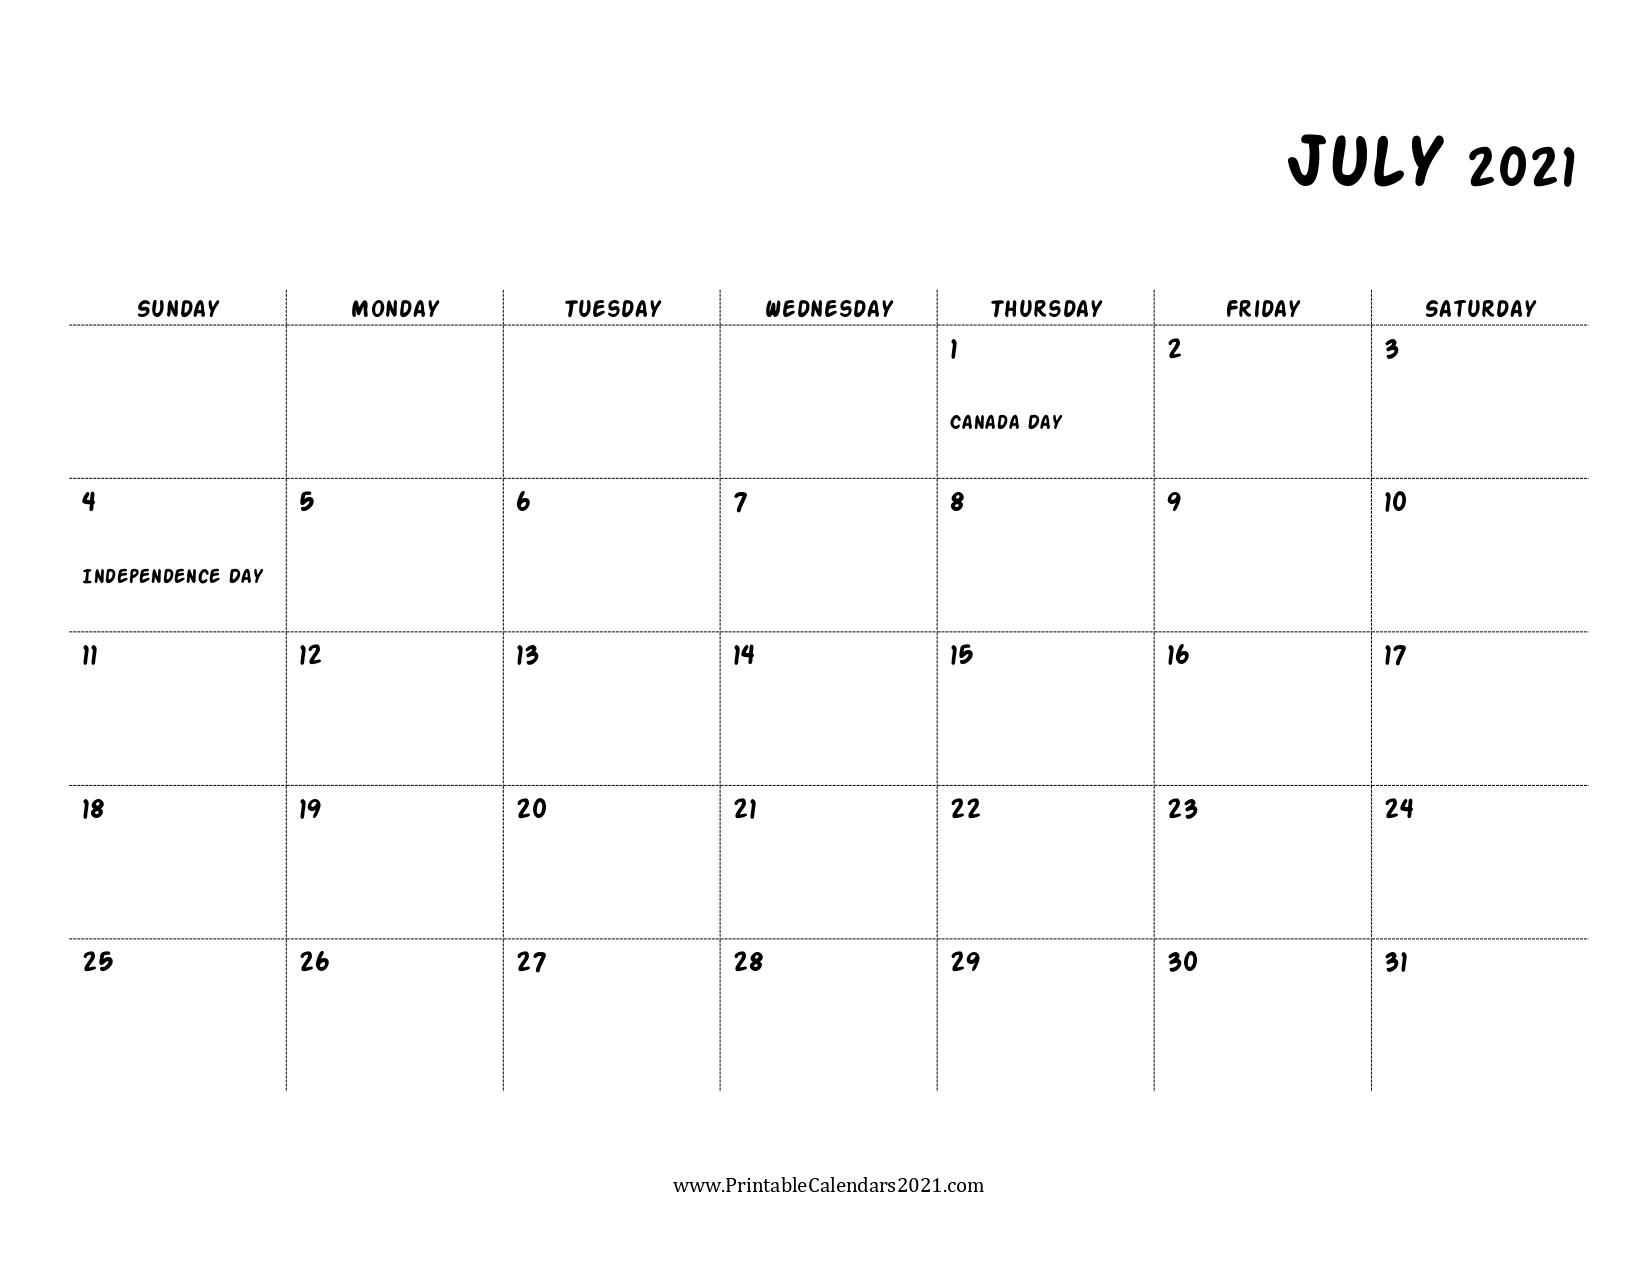 45 July 2021 Calendar Printable July 2021 Calendar Pdf 1